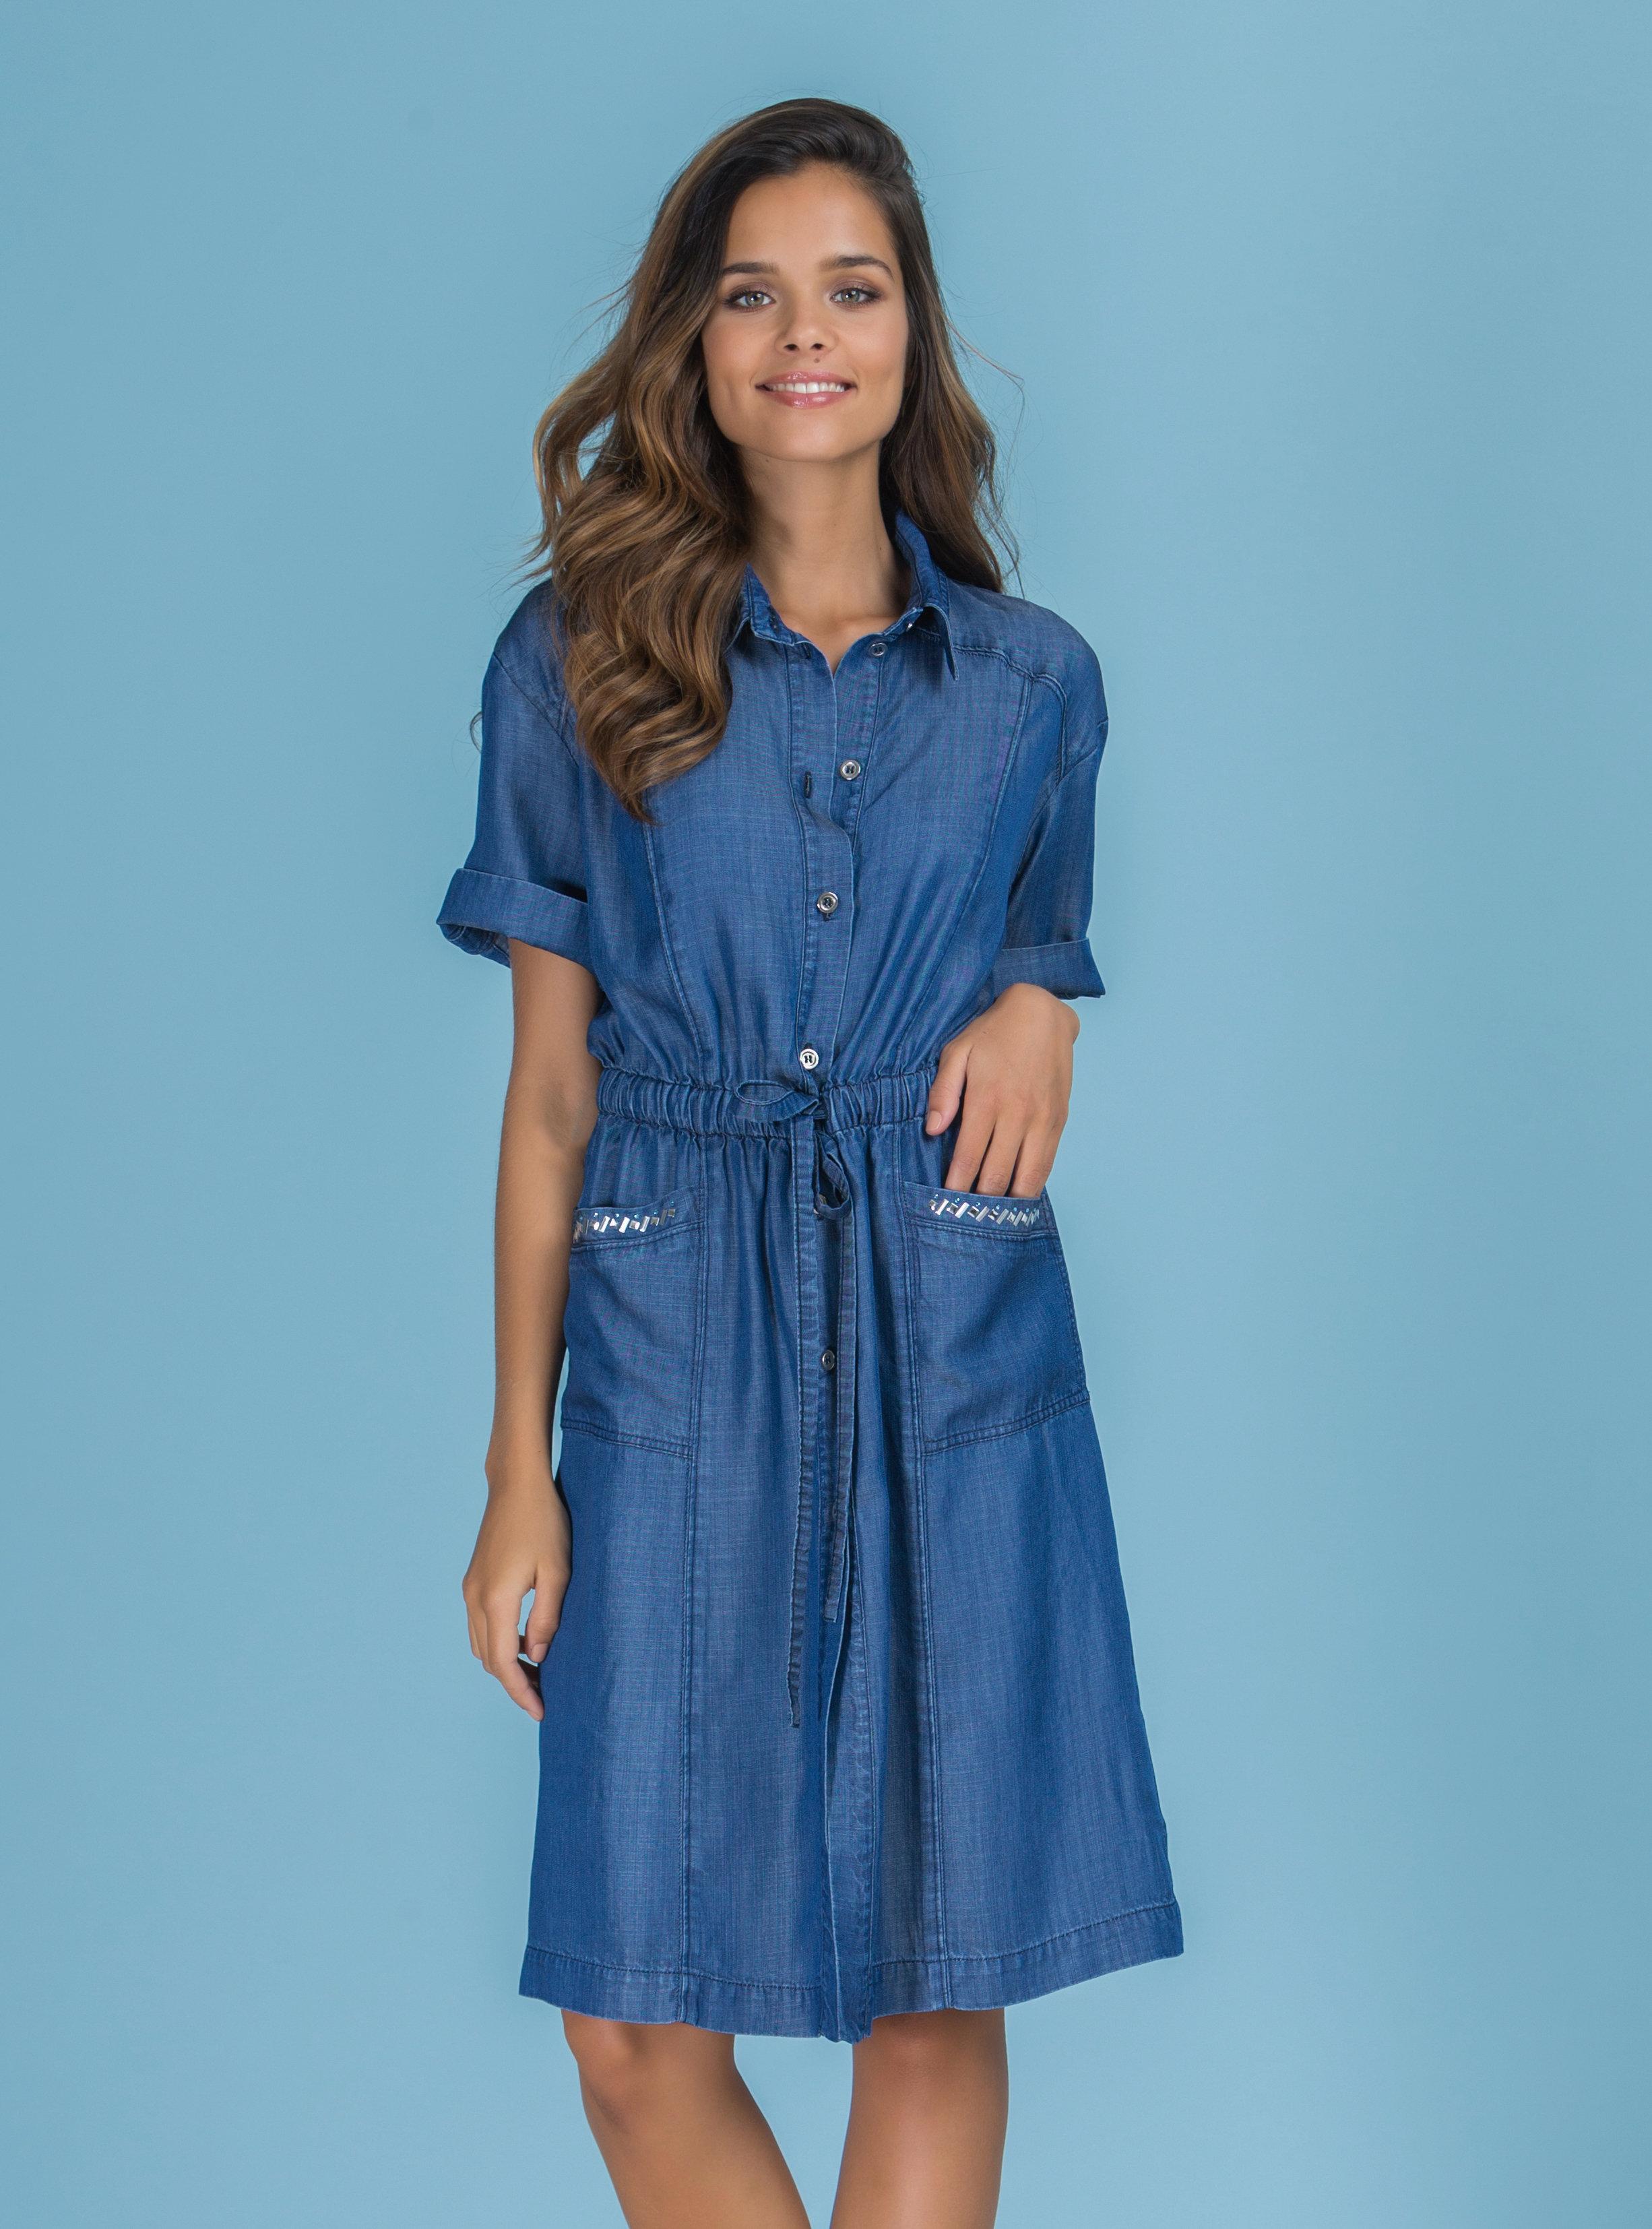 Paul Brial: Comfy Jeans In a Pocket Dress PB_SANFRANCISCO